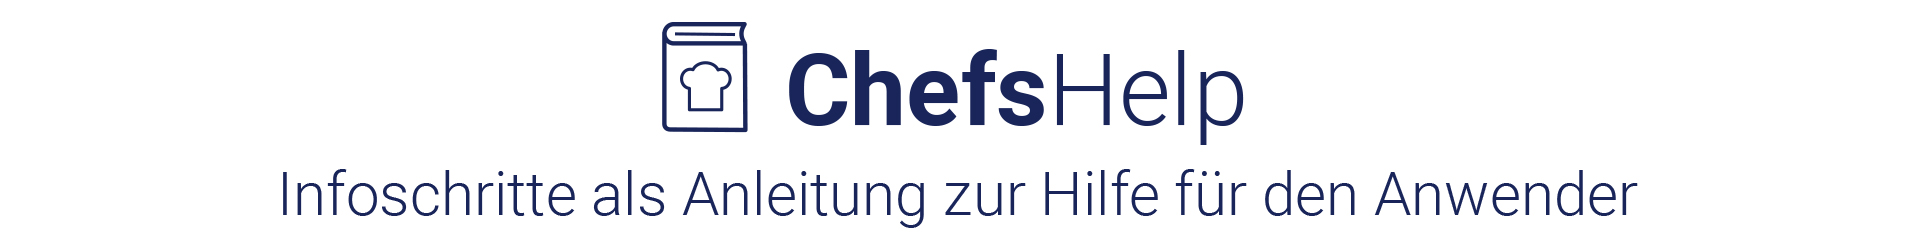 MKN ChefsHelp Banner